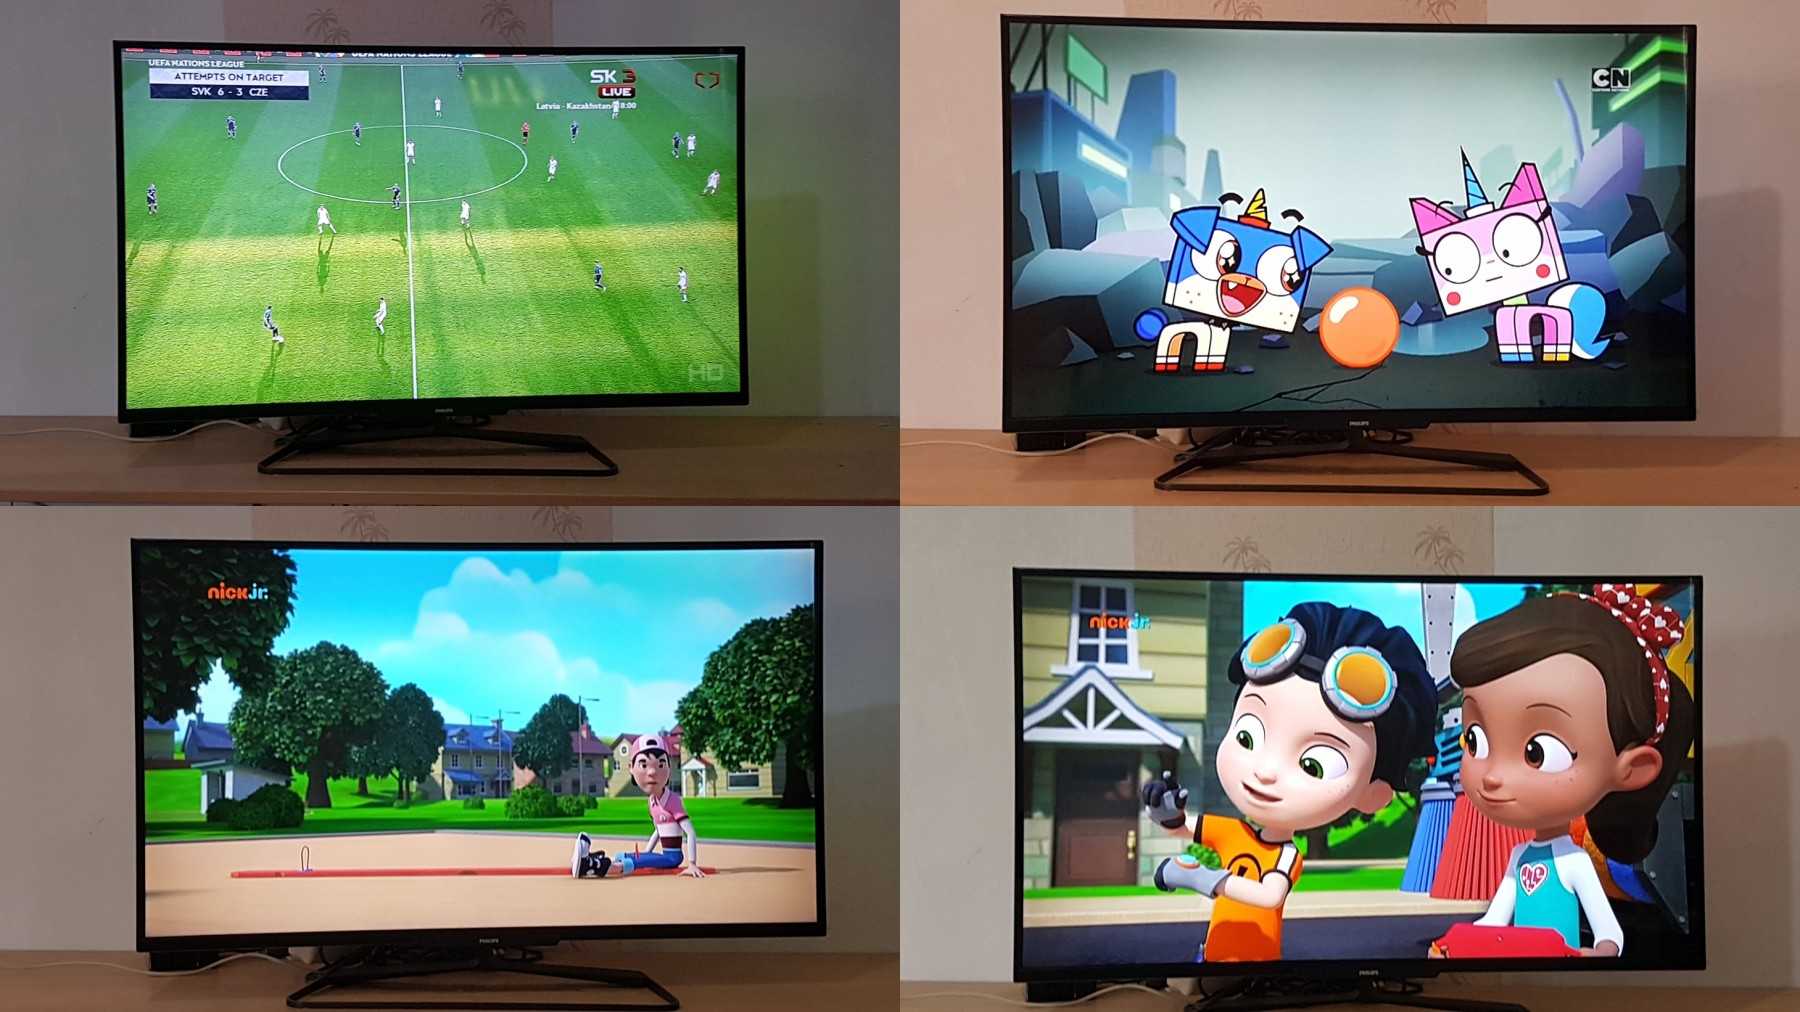 SMART tv PHILIPS 42 inca WIFI,miracast,3D,full hd,AMBI